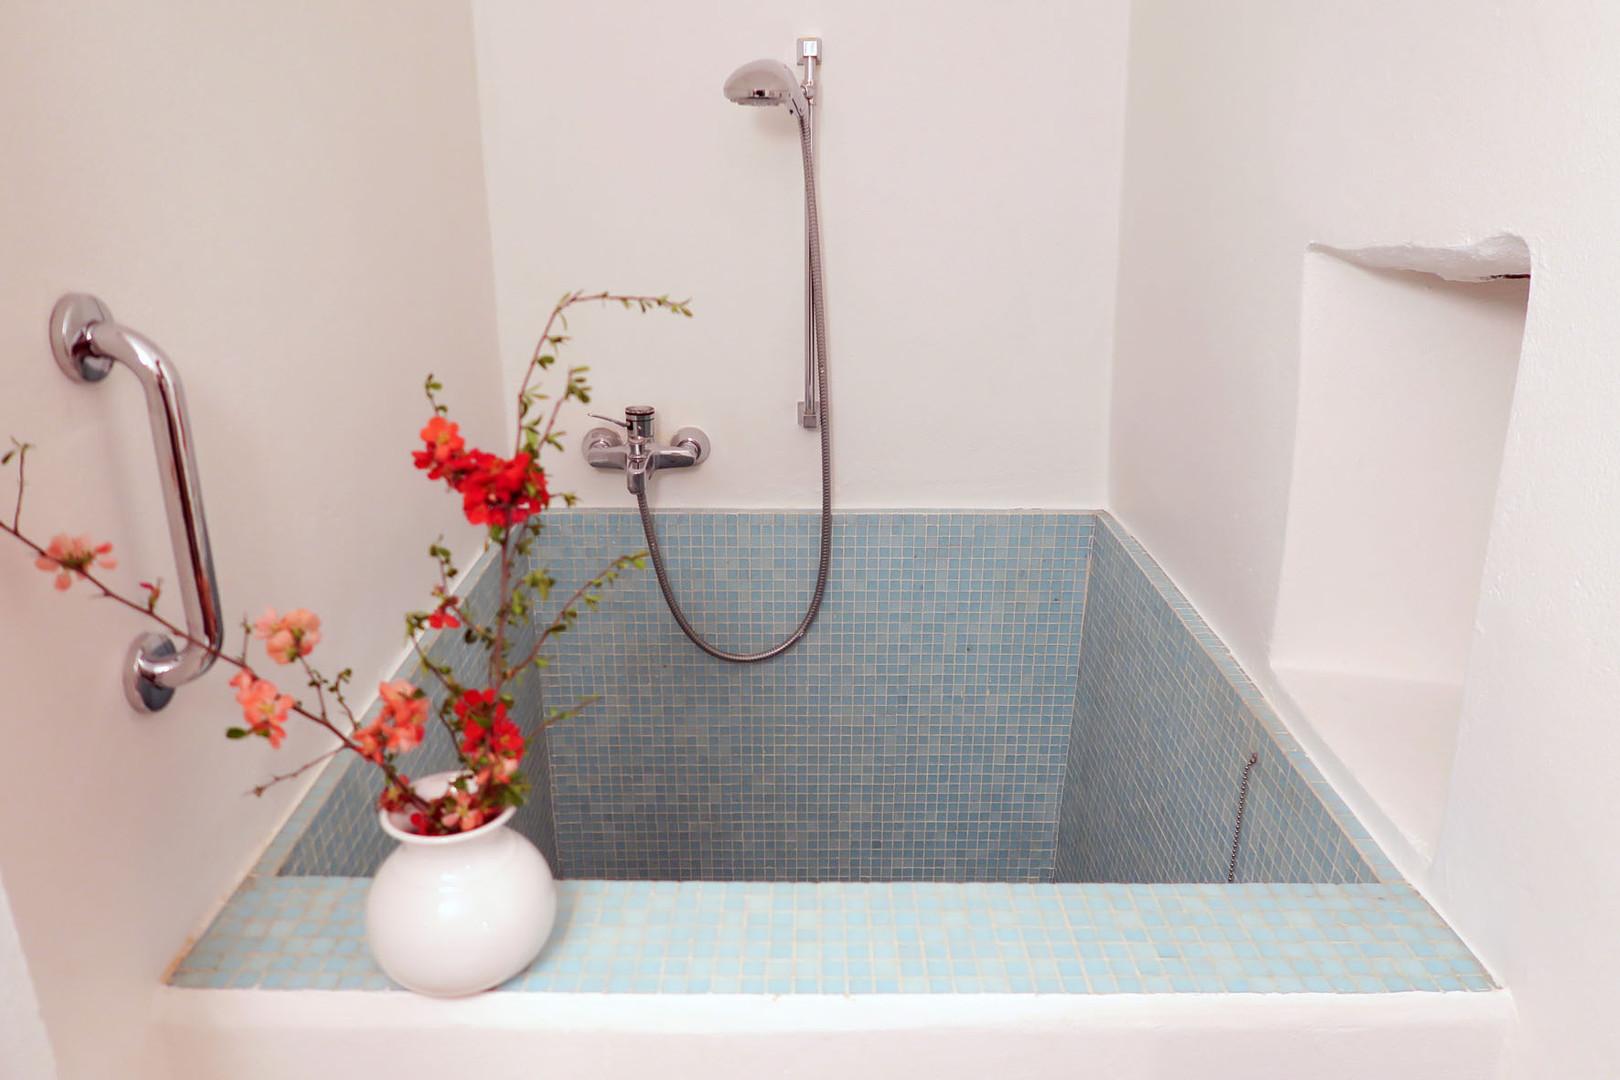 17. vasca sauna appartamento 40mq.jpg